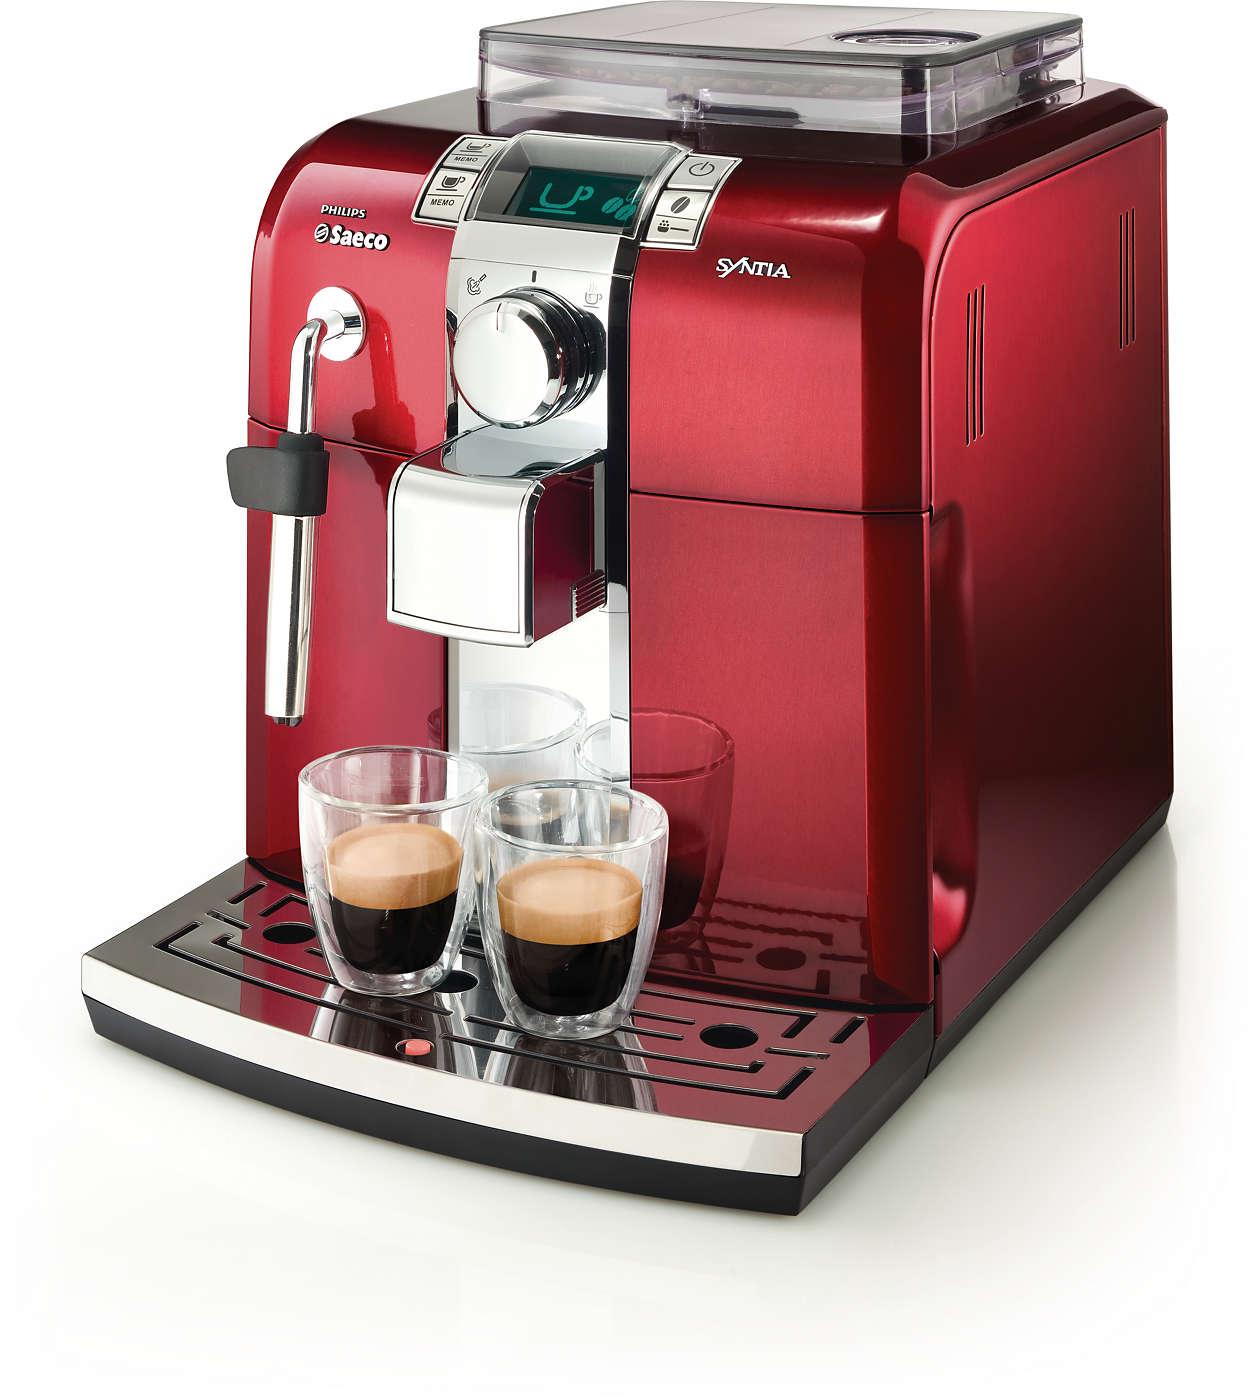 kaffeevollautomat hd8837 32 saeco. Black Bedroom Furniture Sets. Home Design Ideas